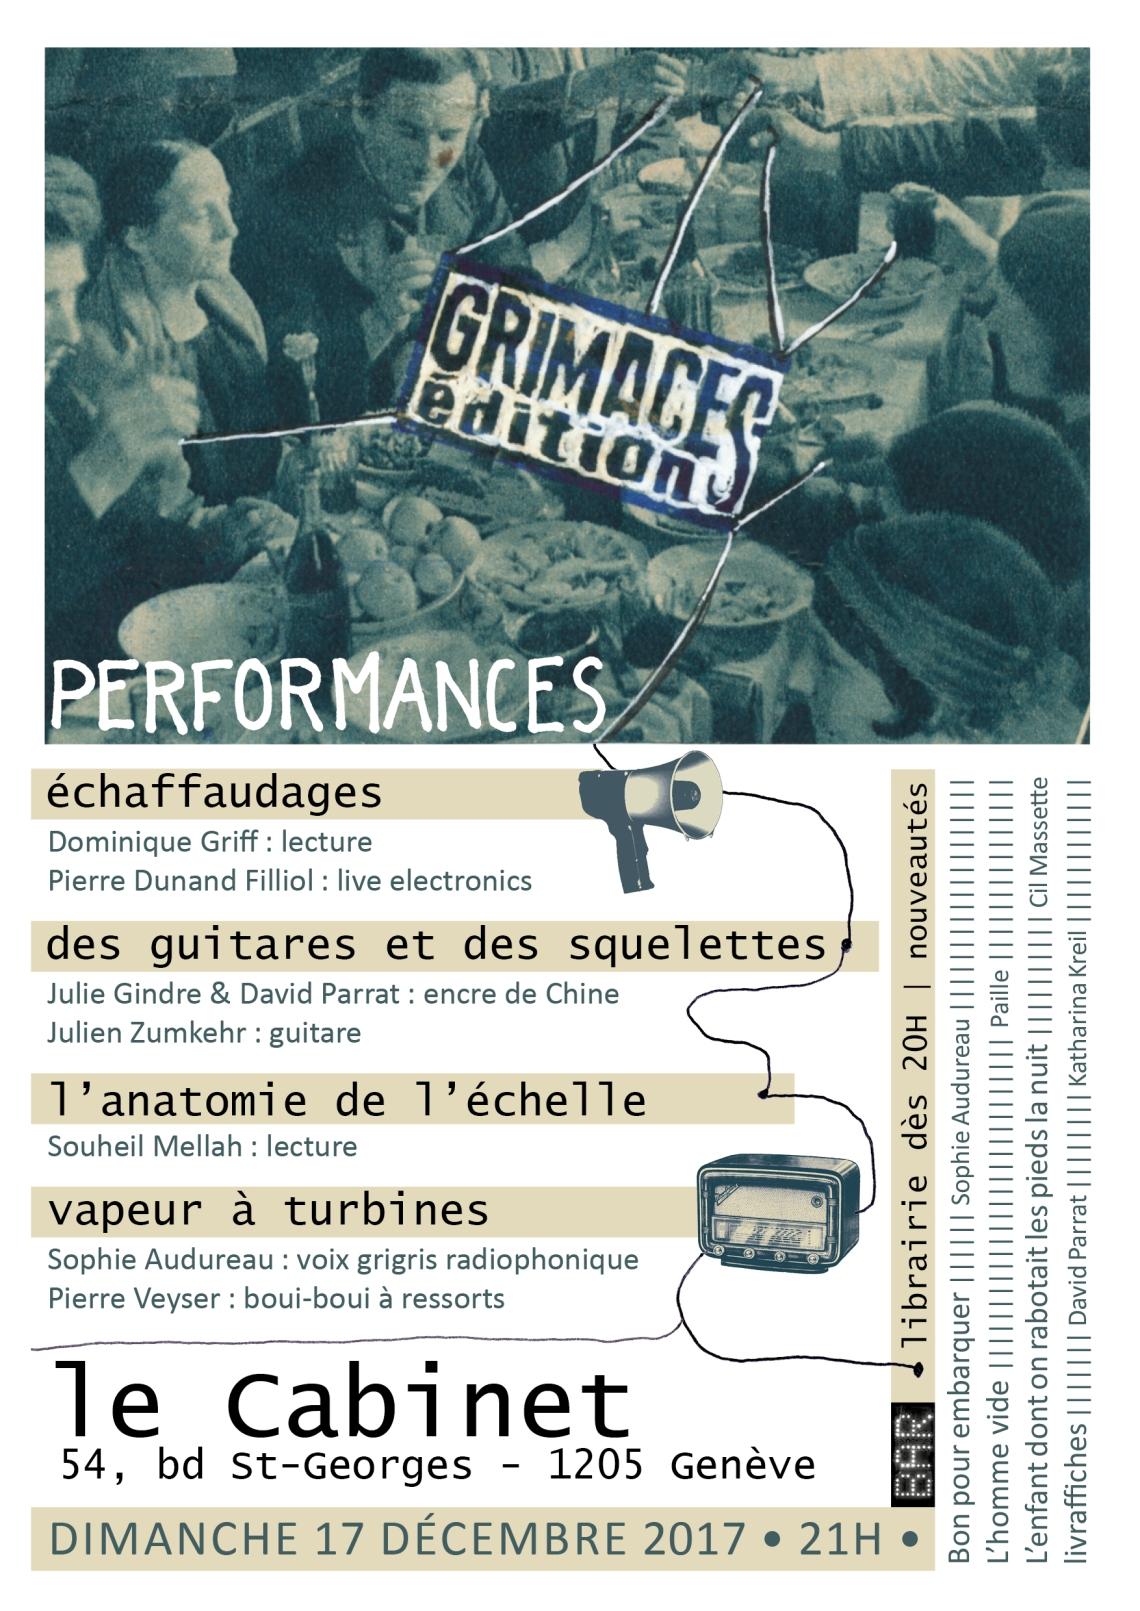 Grimaces_perfos_17_12_17_site